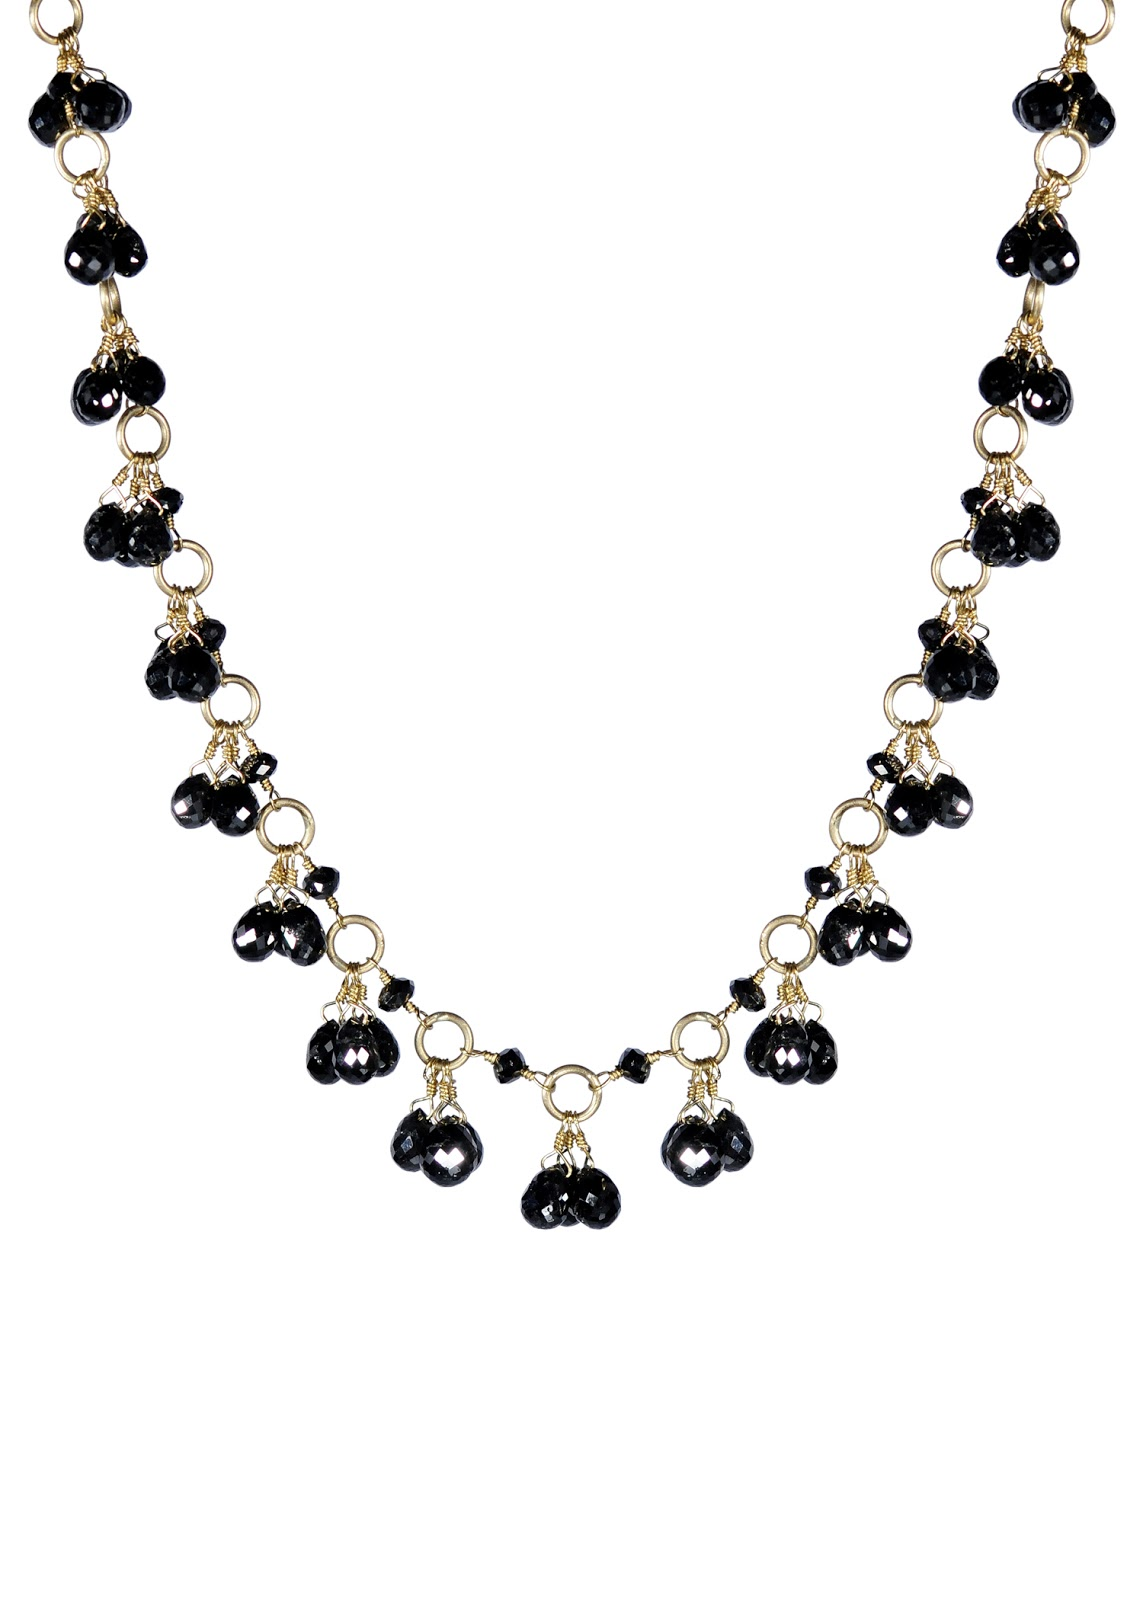 Jewelry News Network The Spectacular Jewelry News Network